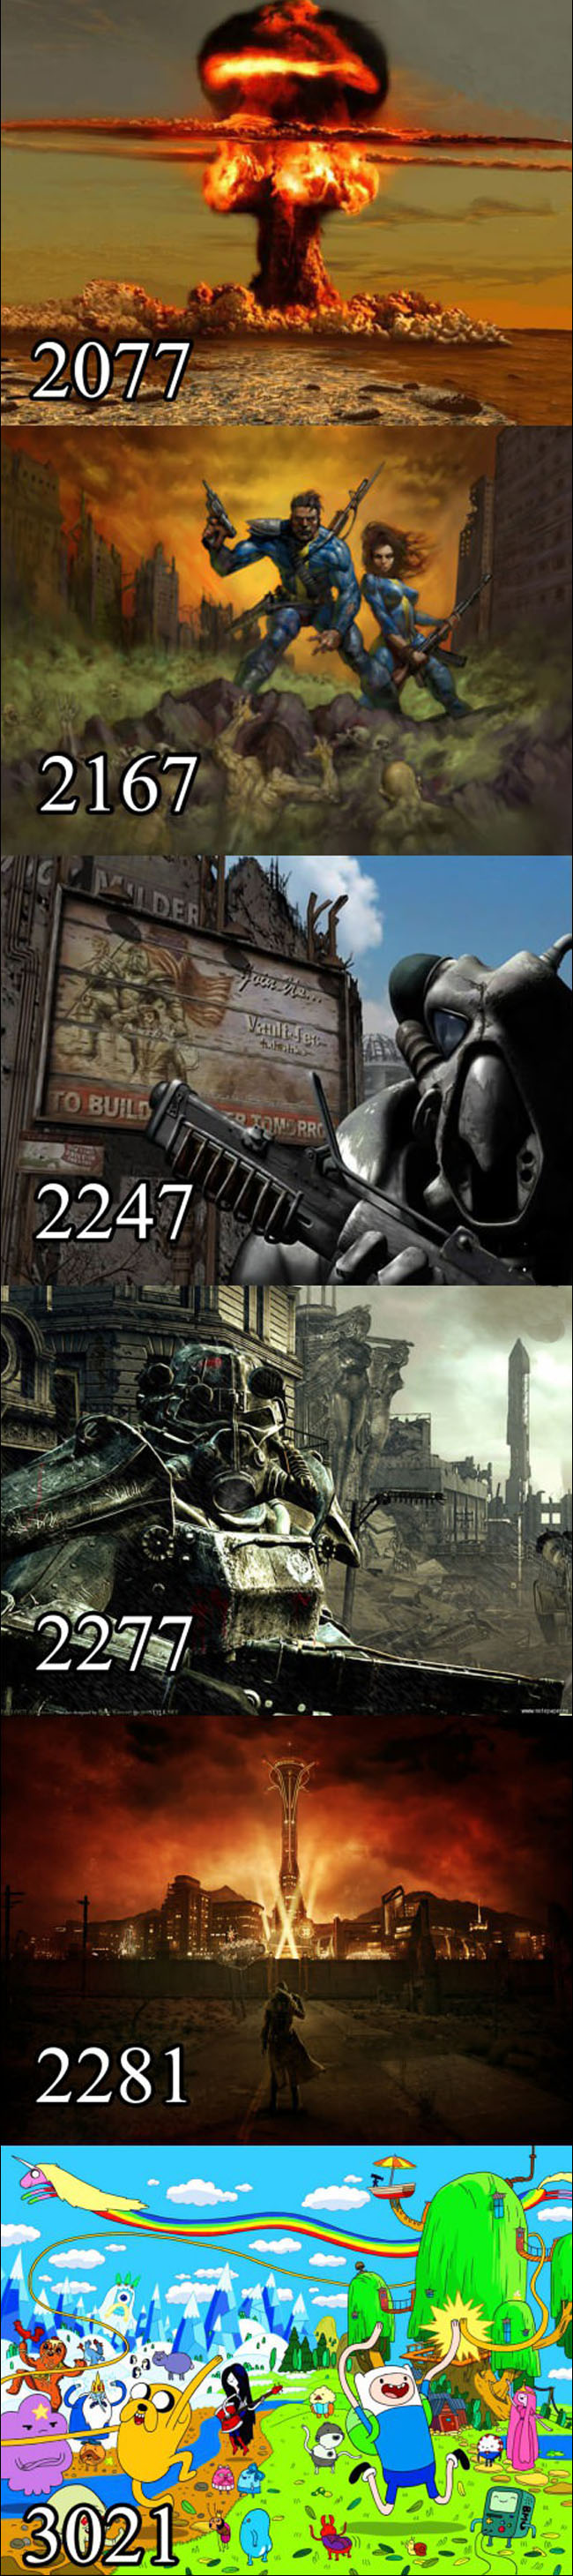 02 - futuro planeta